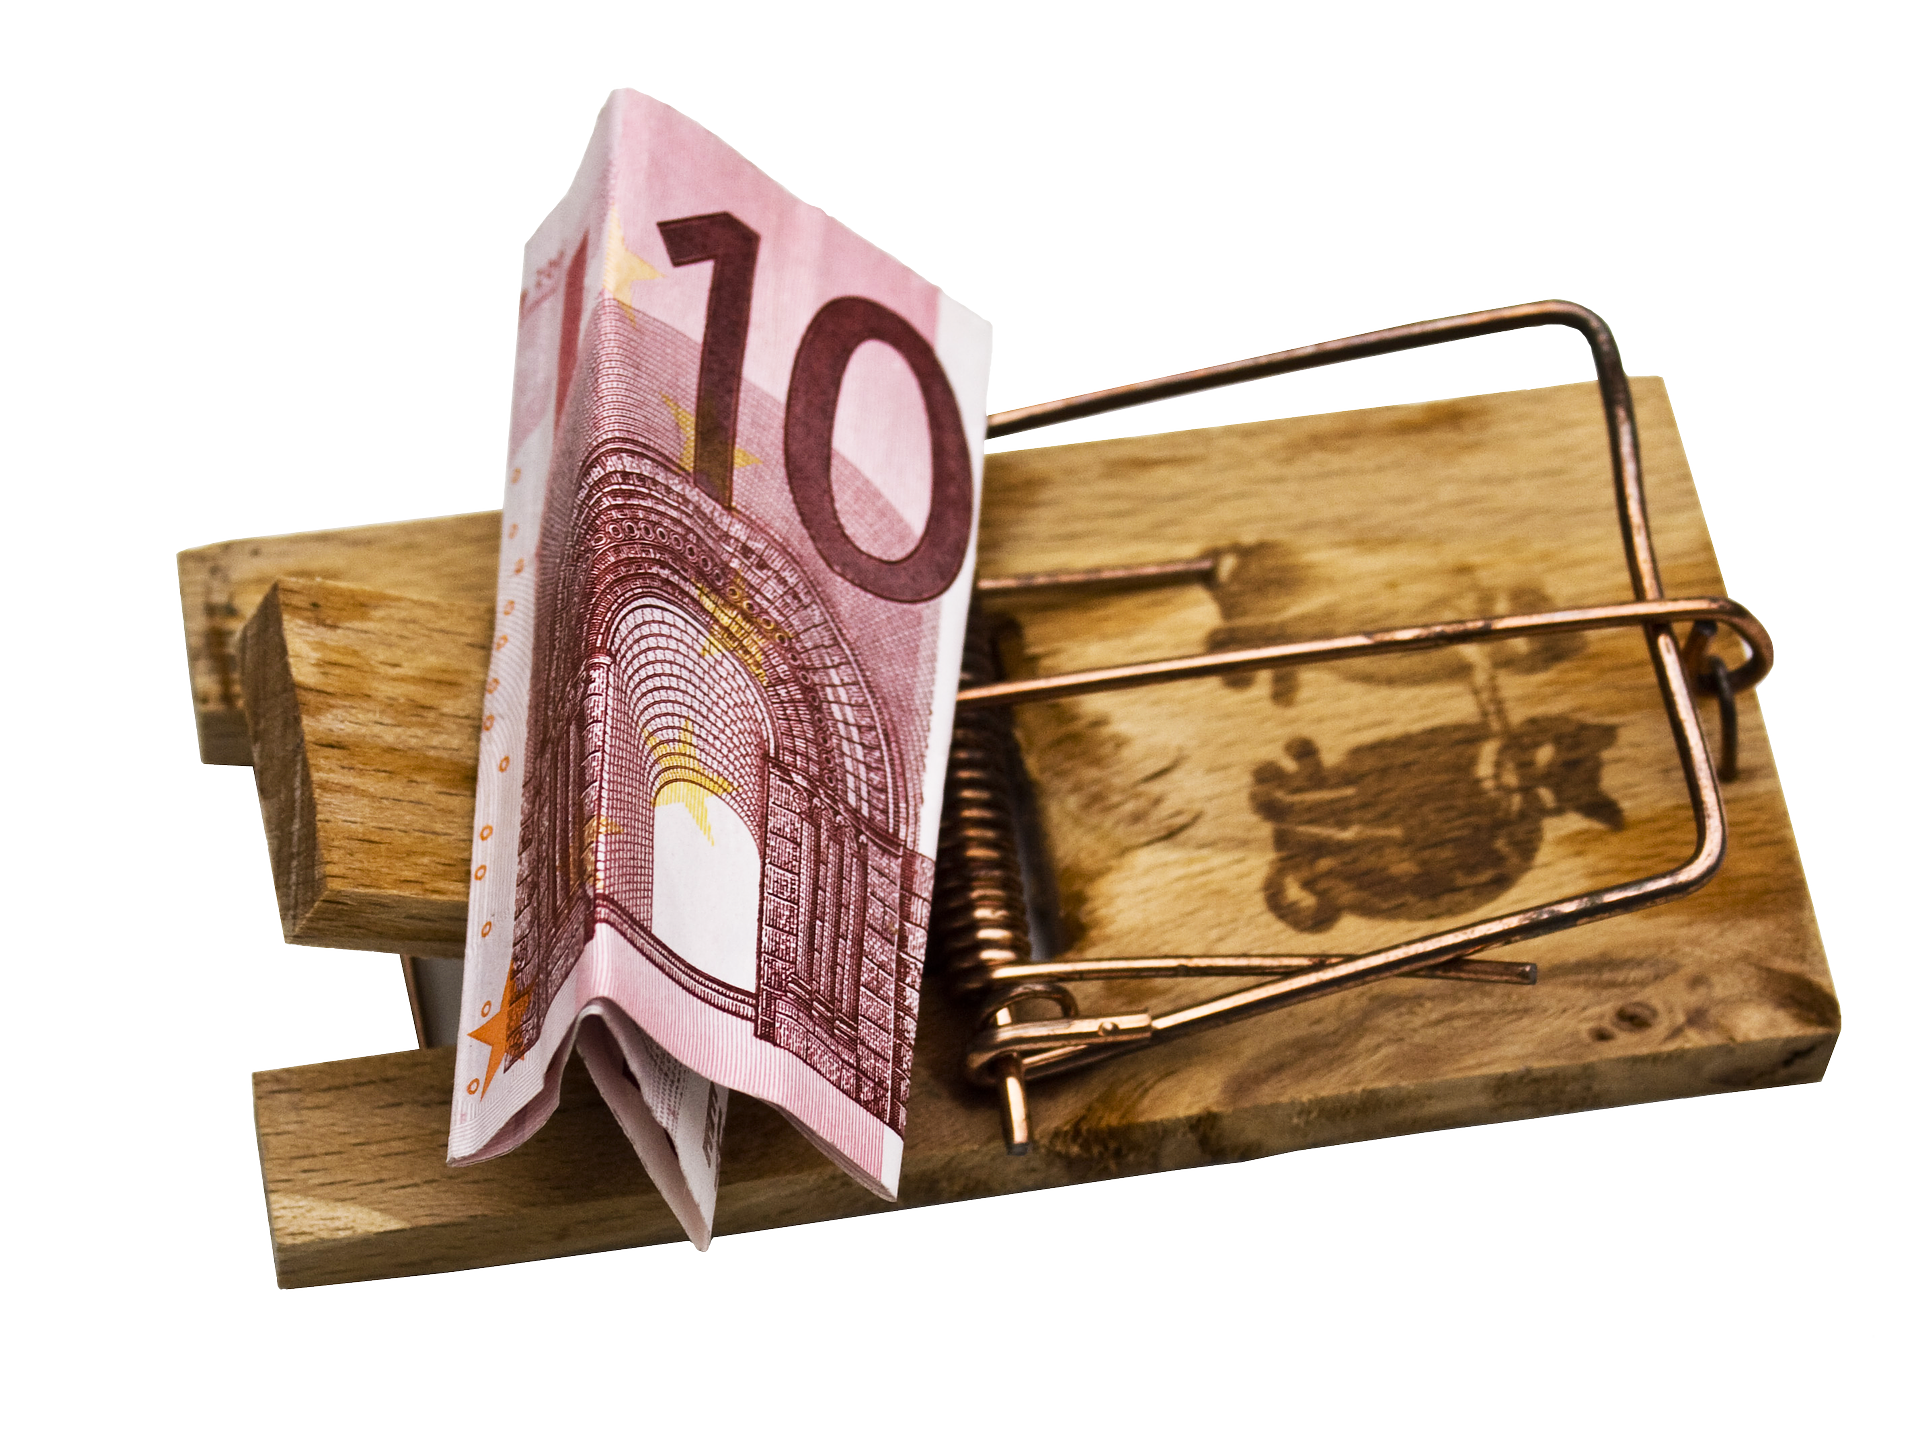 Geldfalle, Abzocke, Abofalle, Betrug, Euro, Falle